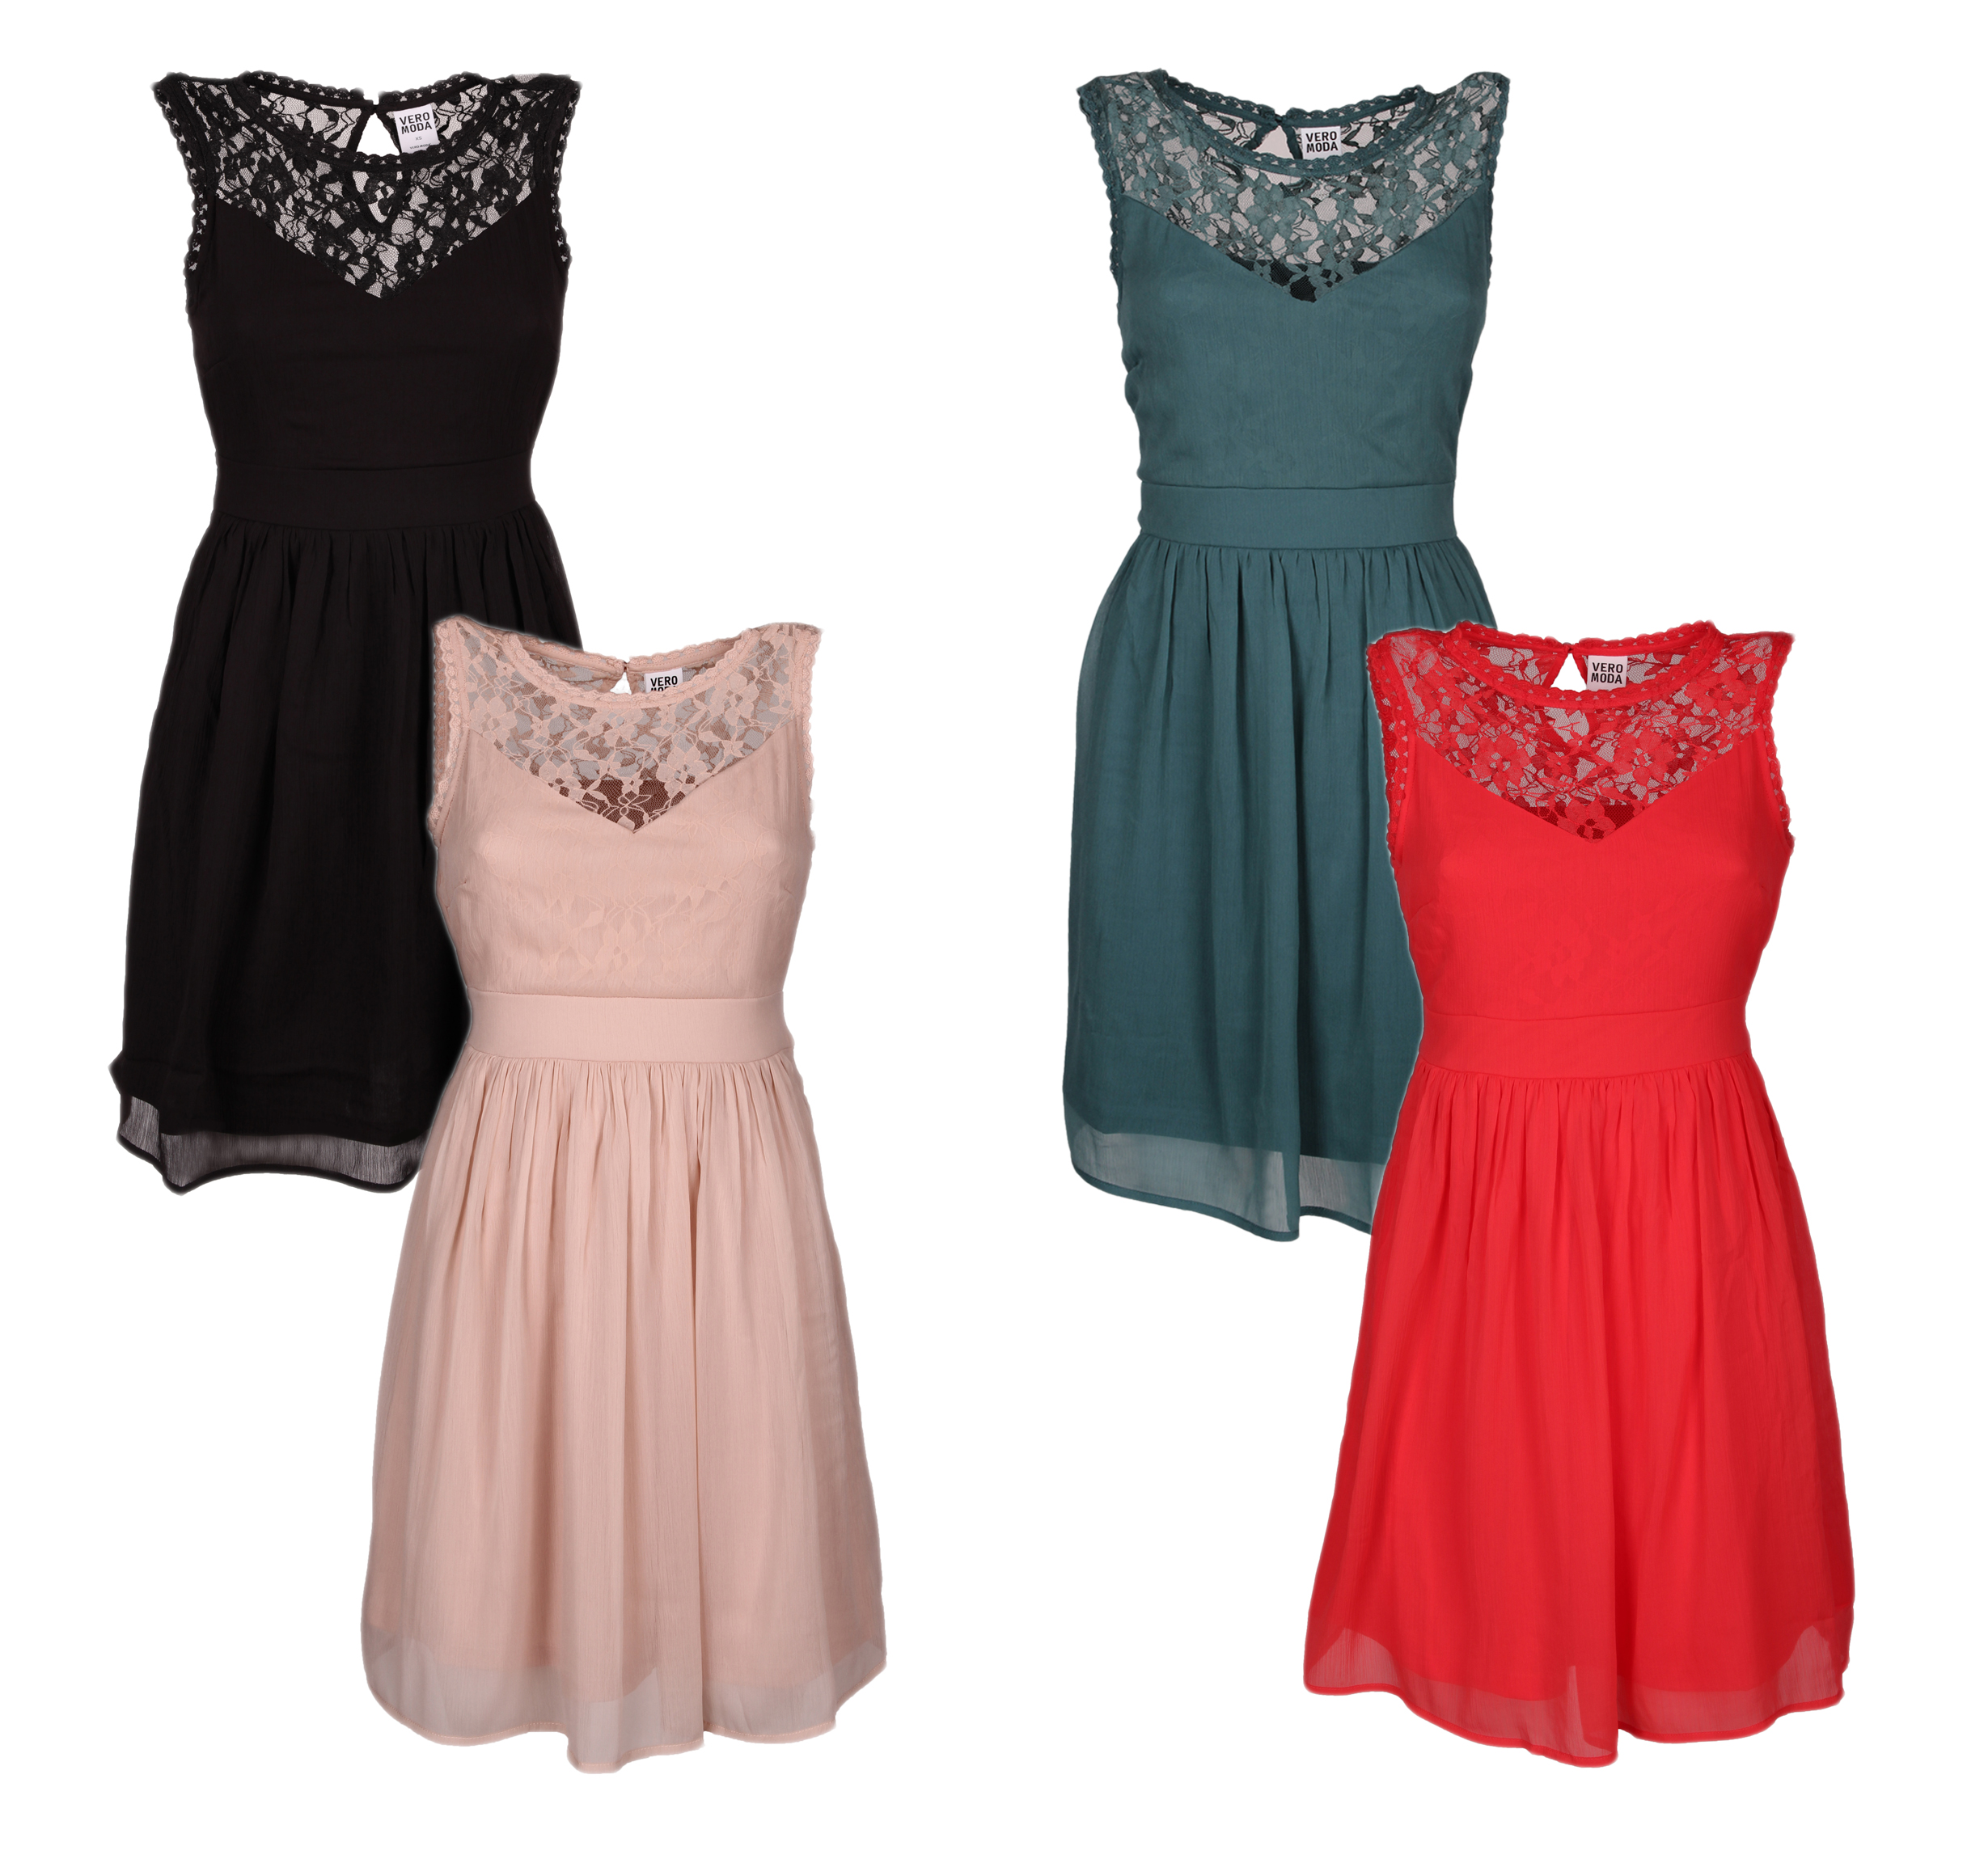 Details zu Damen KLEID Vero Moda MAYA slim line mini dress noos 19  women dress